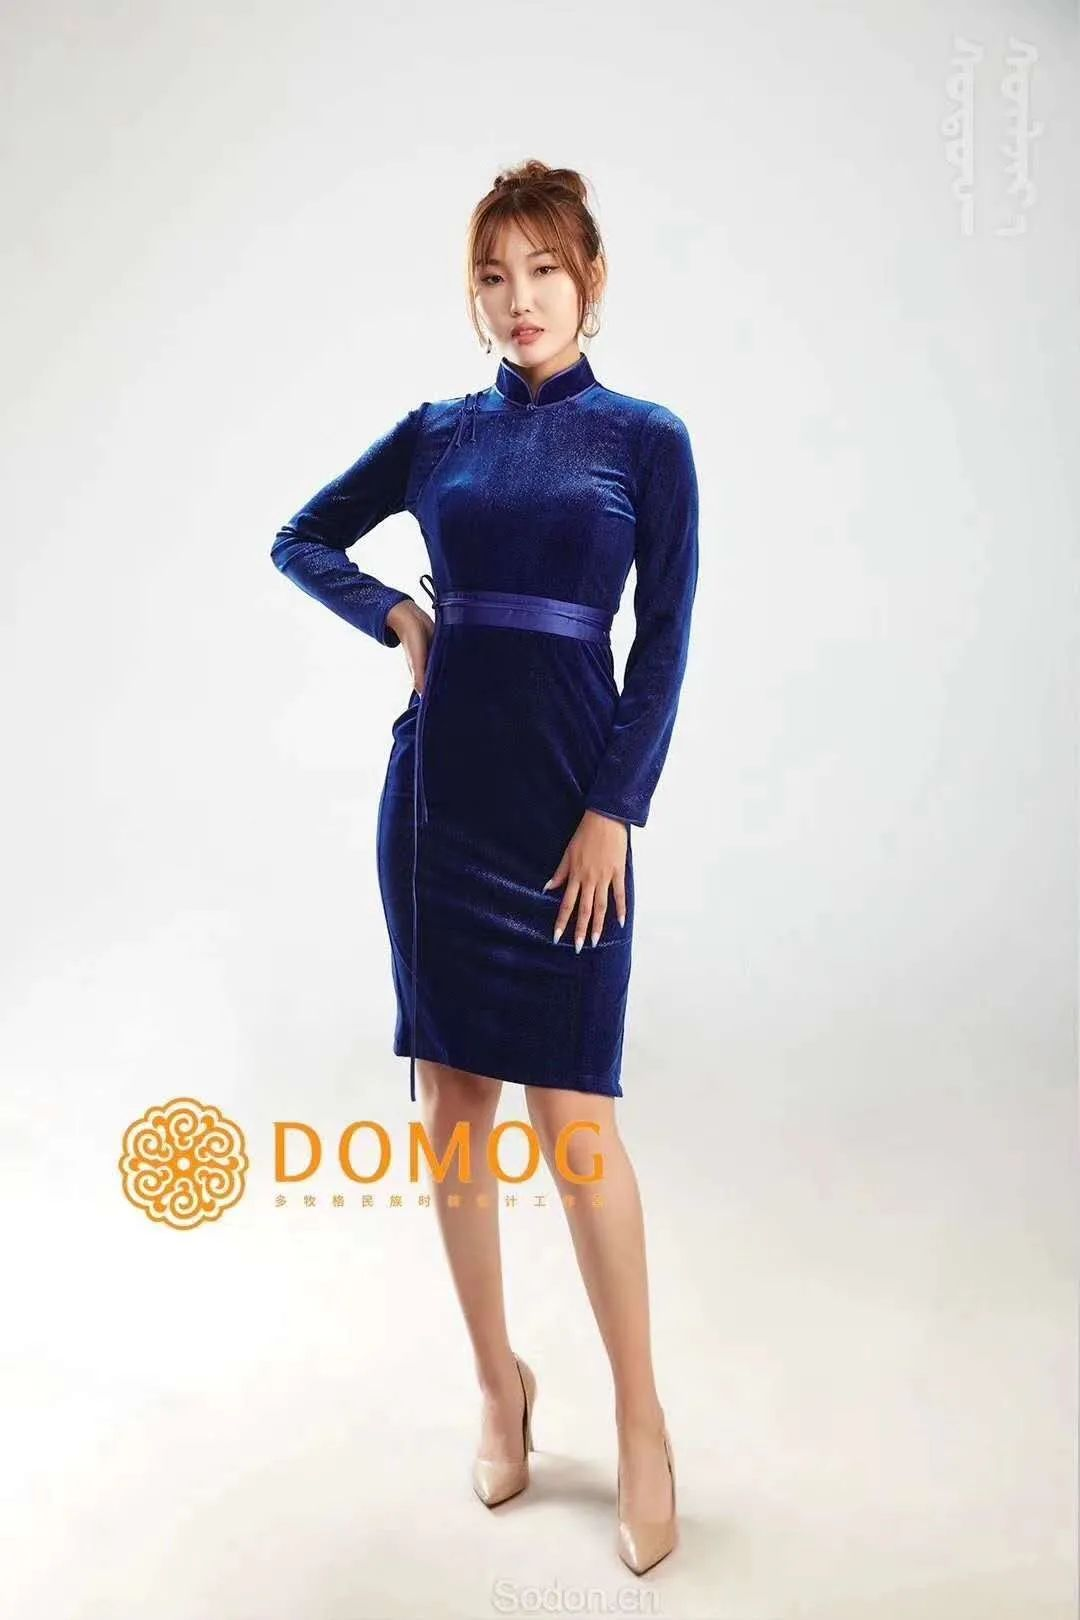 DOMOG 蒙古时装2020新款,民族与时尚的融合 第52张 DOMOG 蒙古时装2020新款,民族与时尚的融合 蒙古服饰